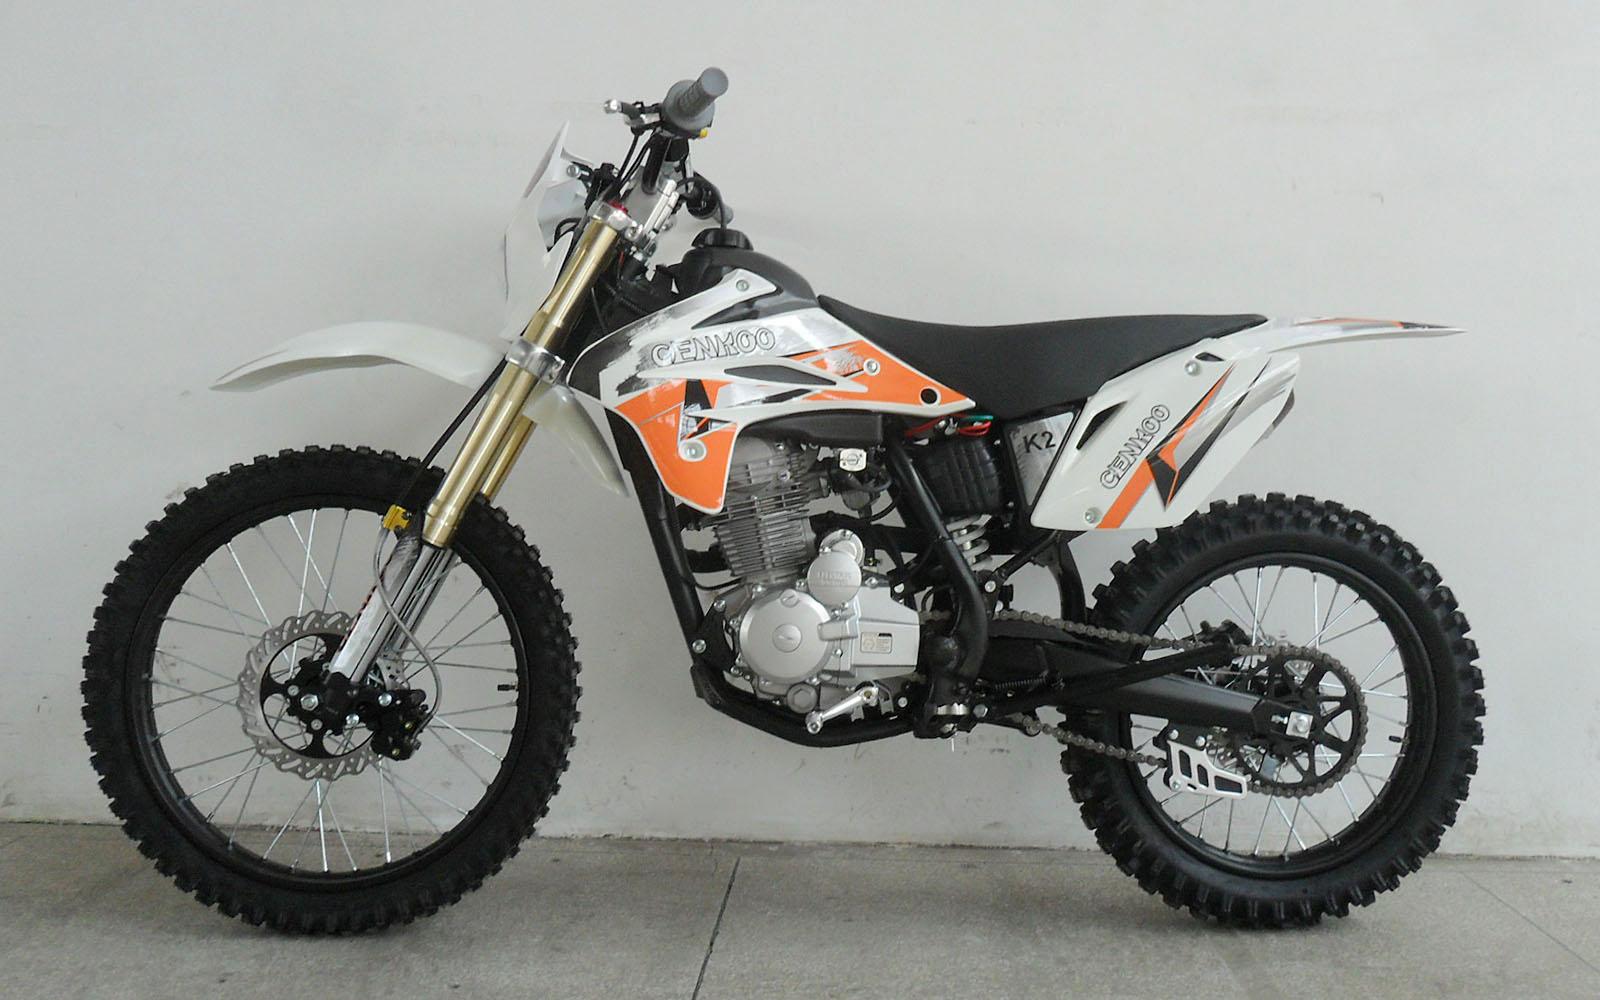 cenkoo k2 250cc 21 18 enduro motocross dirt bike white ebay. Black Bedroom Furniture Sets. Home Design Ideas